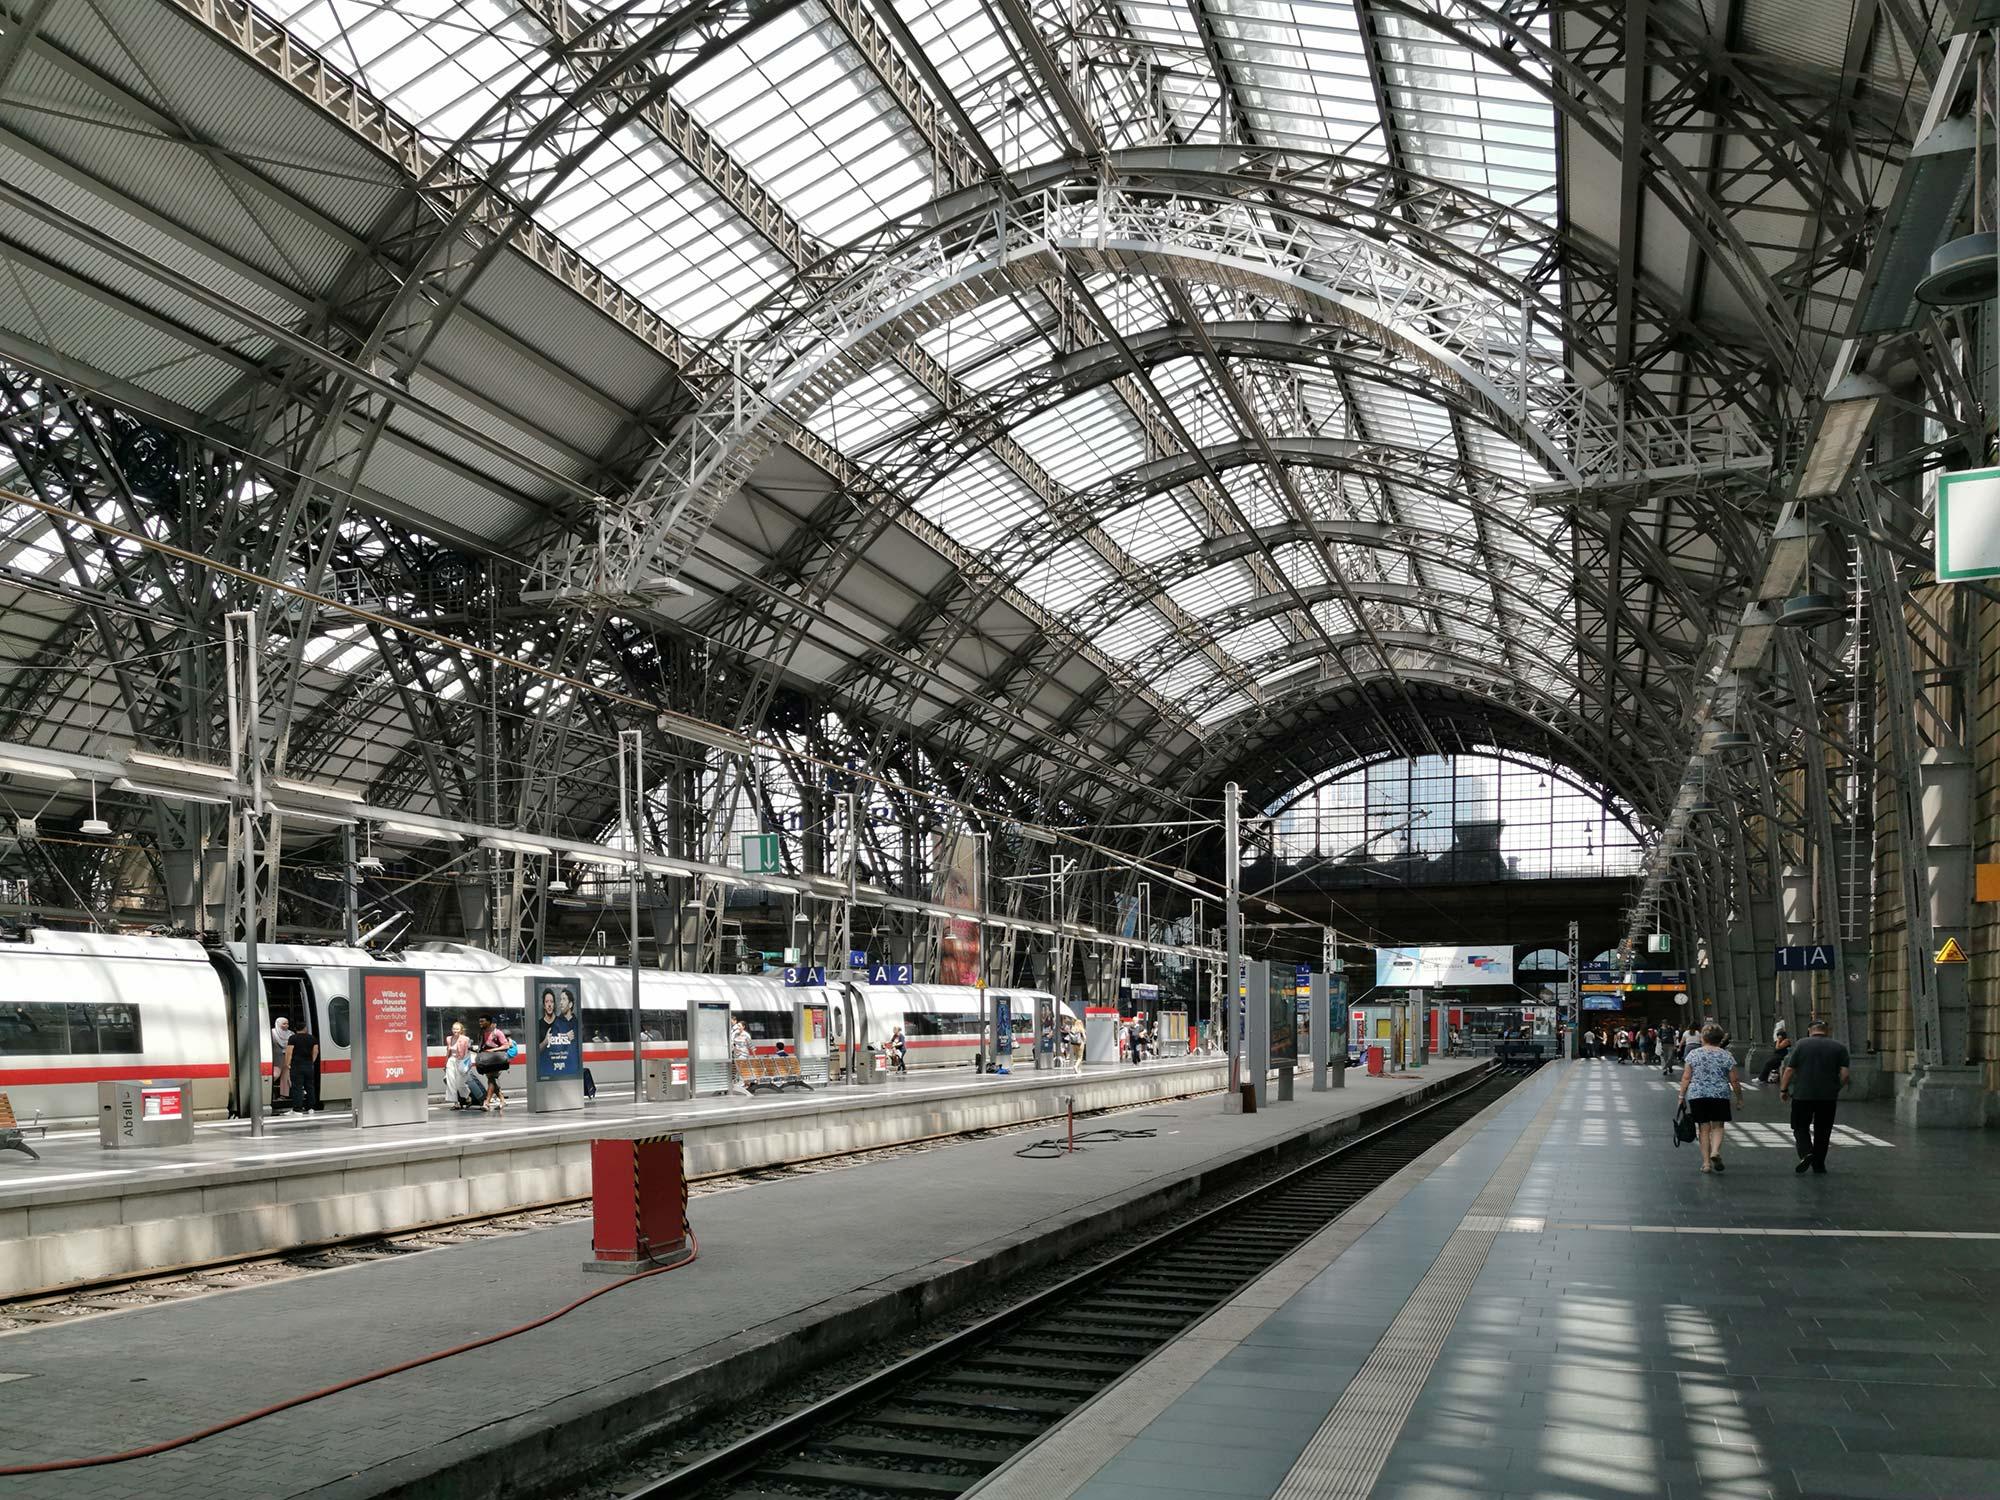 Frankfurt Gleishalle Bahnhof - Hauptbahnhof FFM - ICE - Zug - Gleise - Bahnsteig